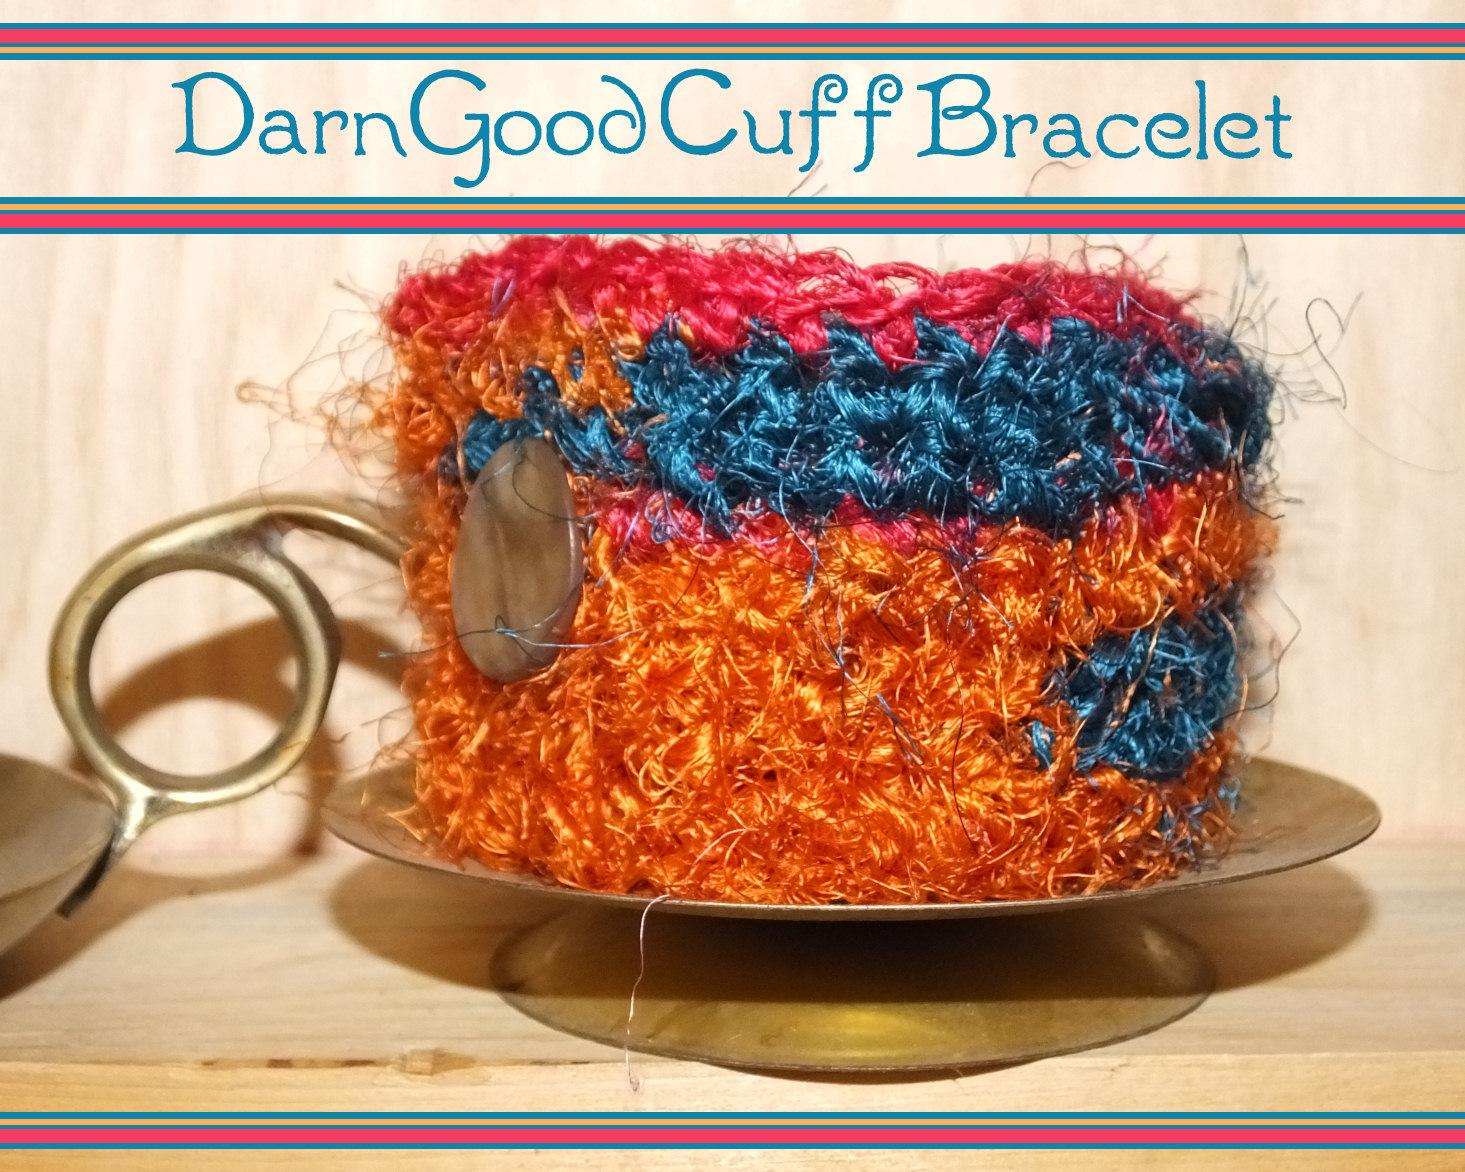 Darn Good Cuff Bracelet- a bracelet made with recycled sari silk yarn